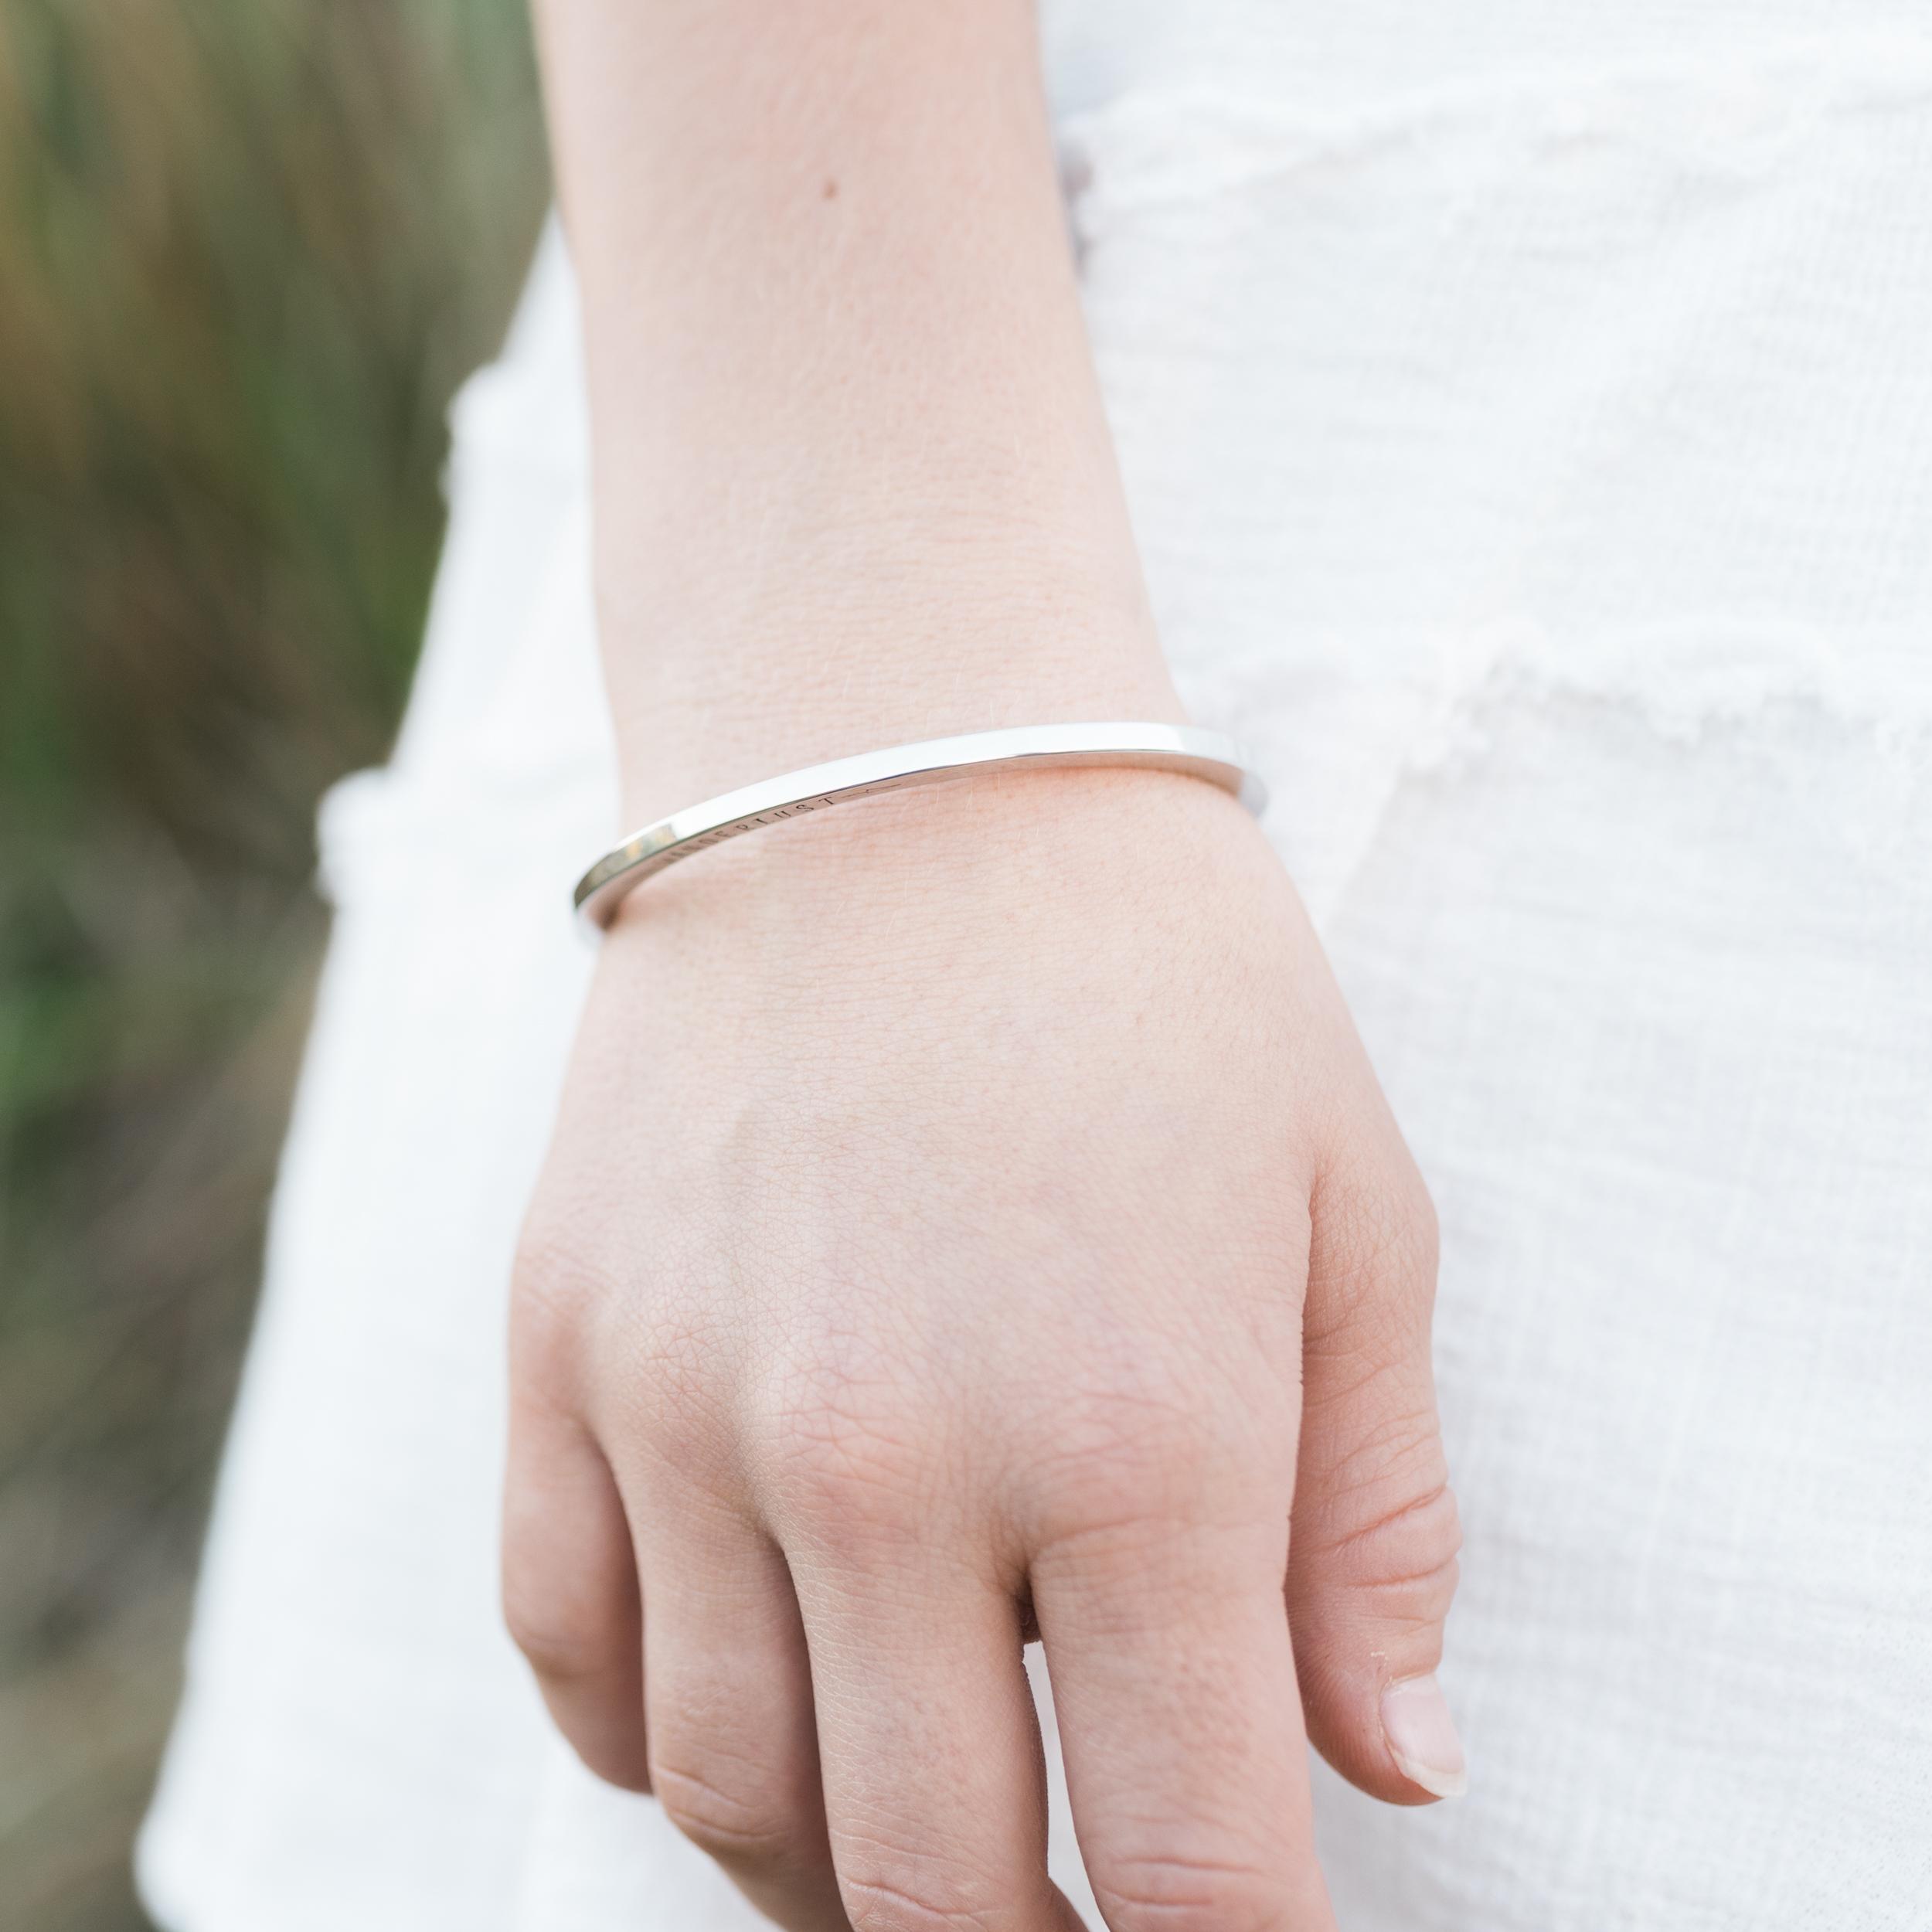 jewelry-branding-photography-guam-roxanne-augusta-18.jpg